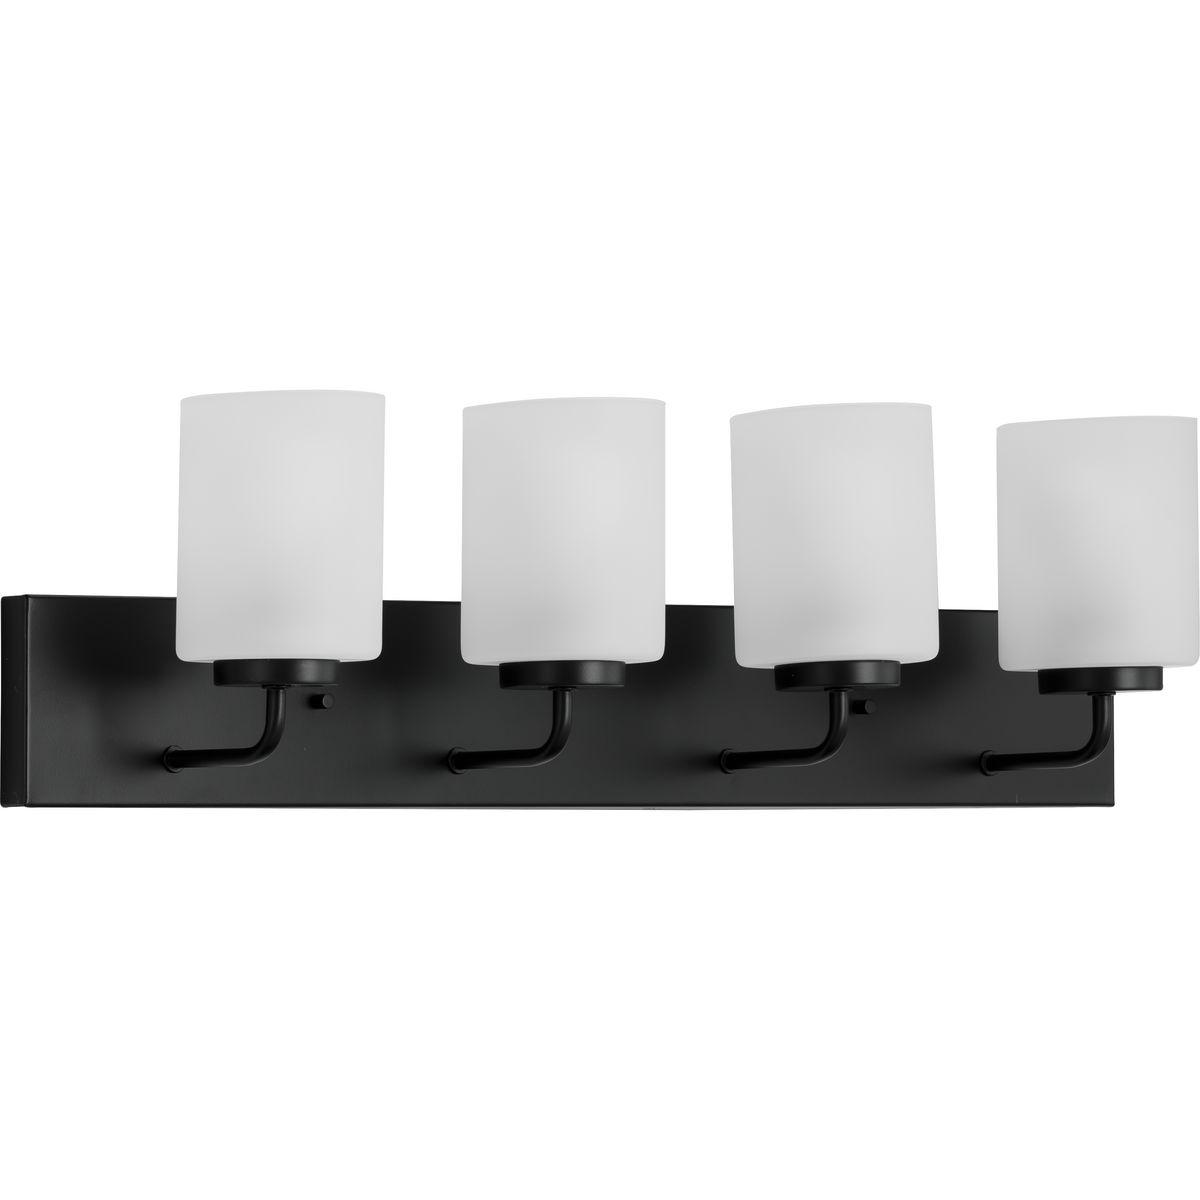 Merry Collection Four Light Etched Glass Matte Black Transitional Bath Vanity Light P300330 031 Progress Lighting